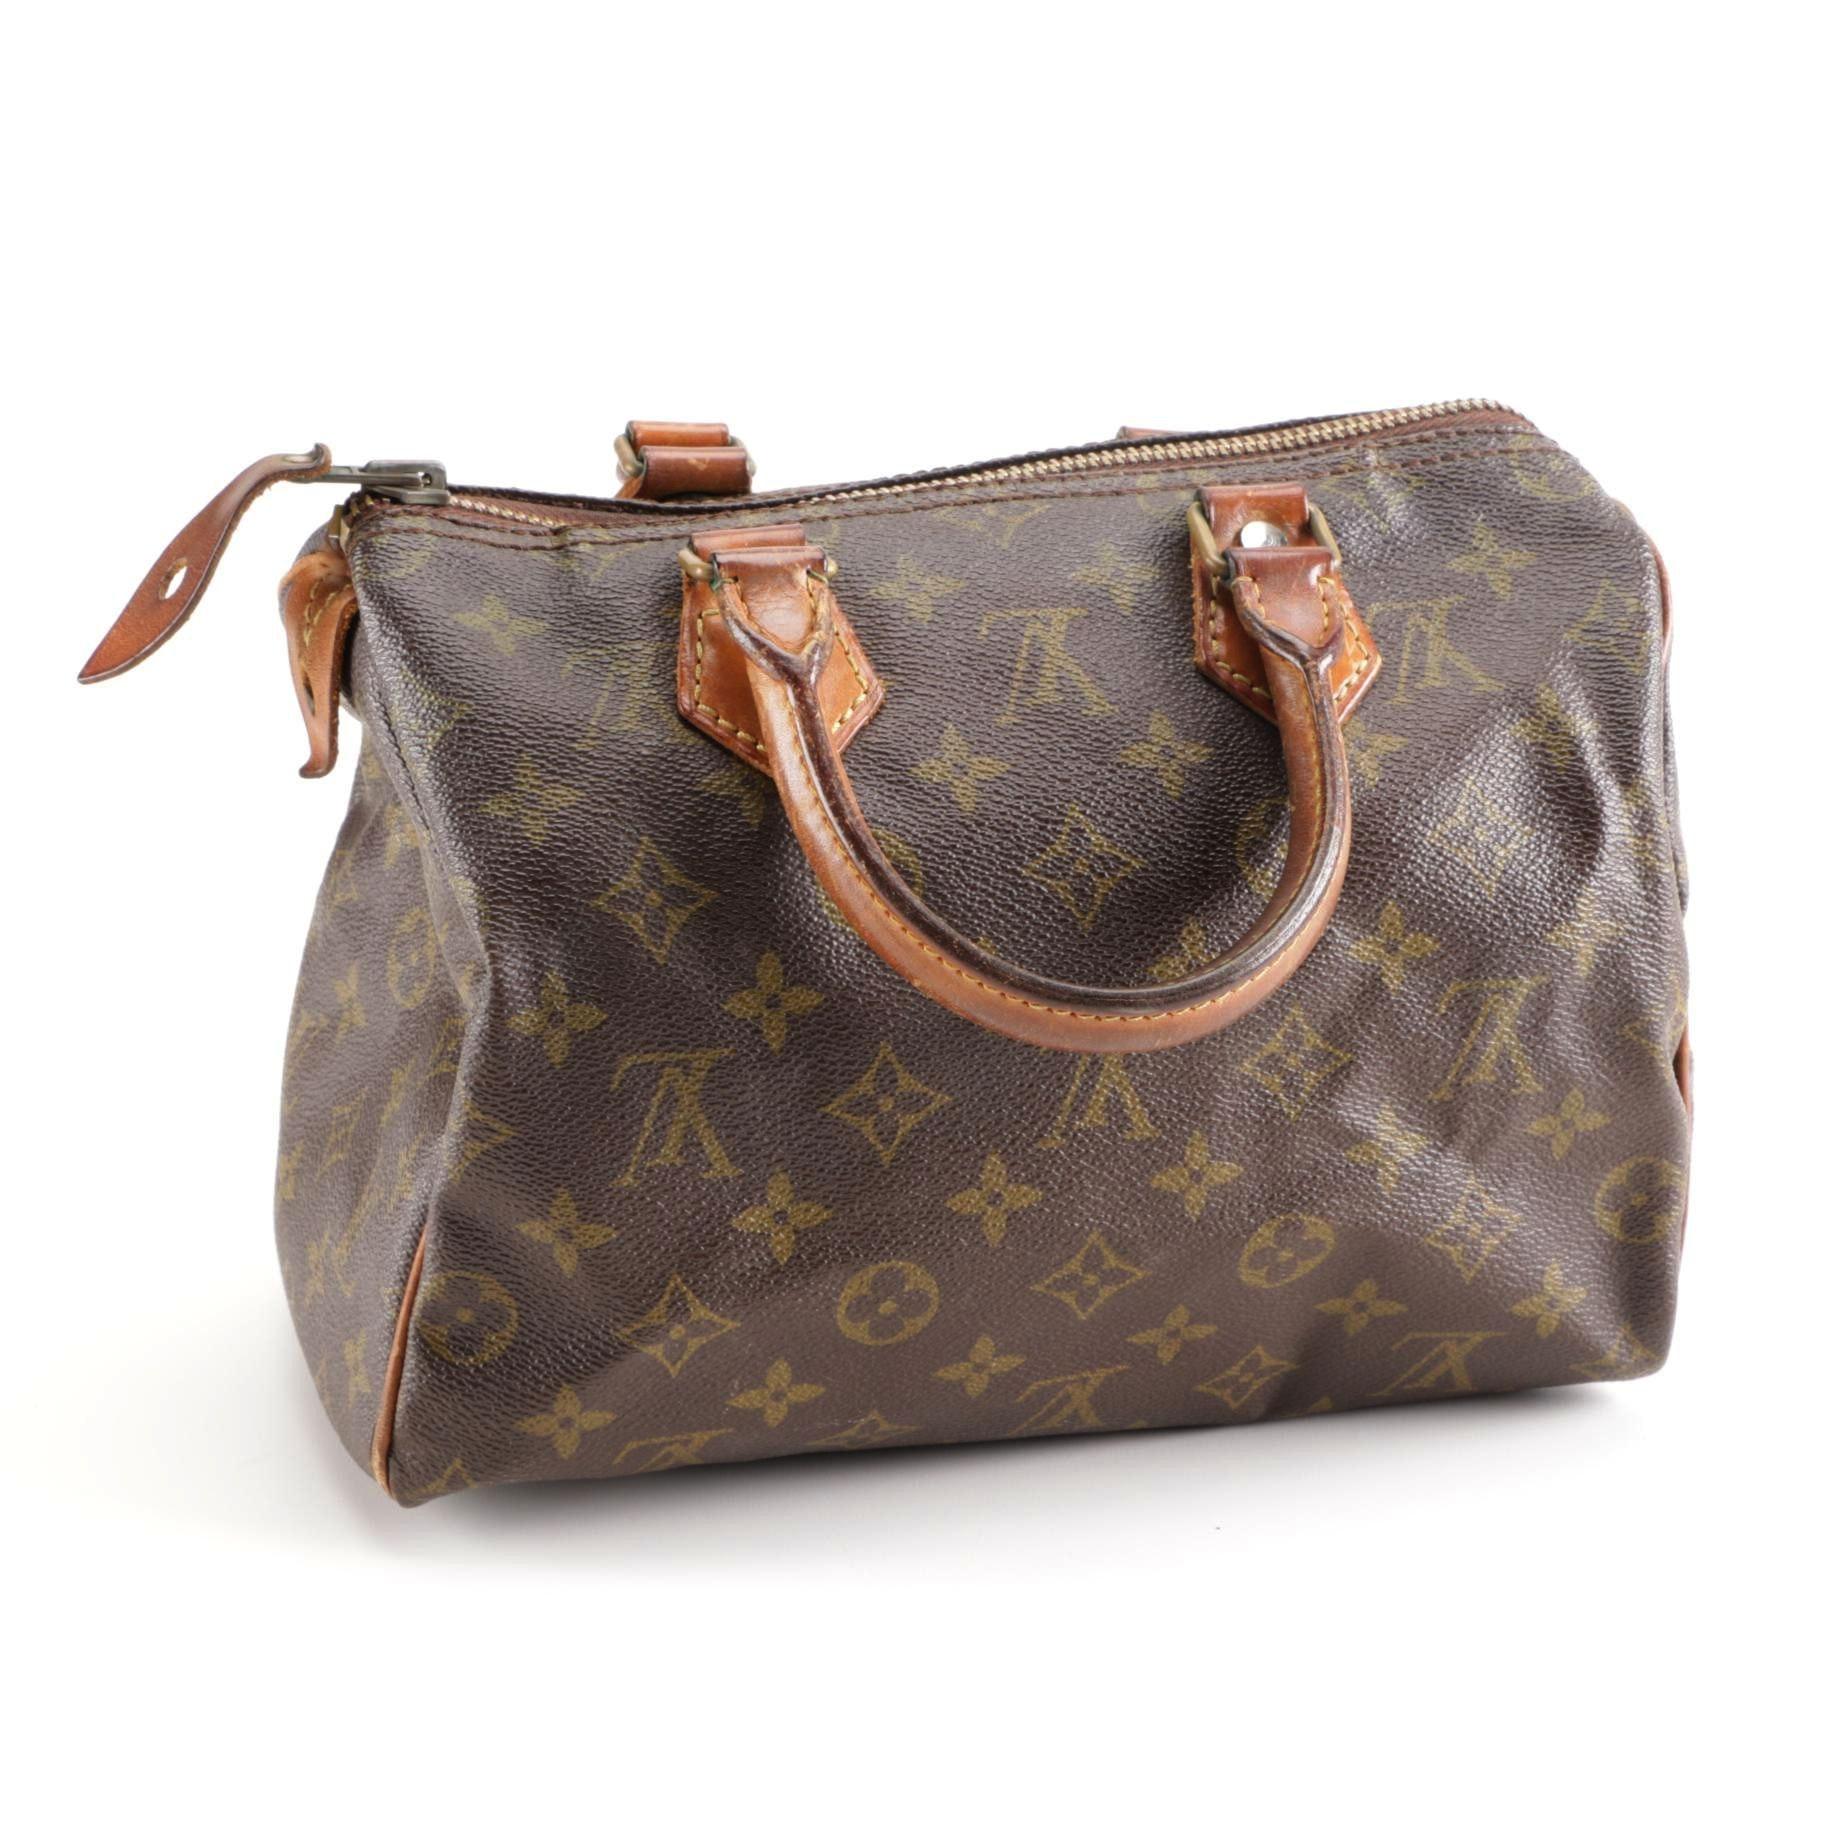 Louis Vuitton Monogrammed Canvas Speedy Handbag